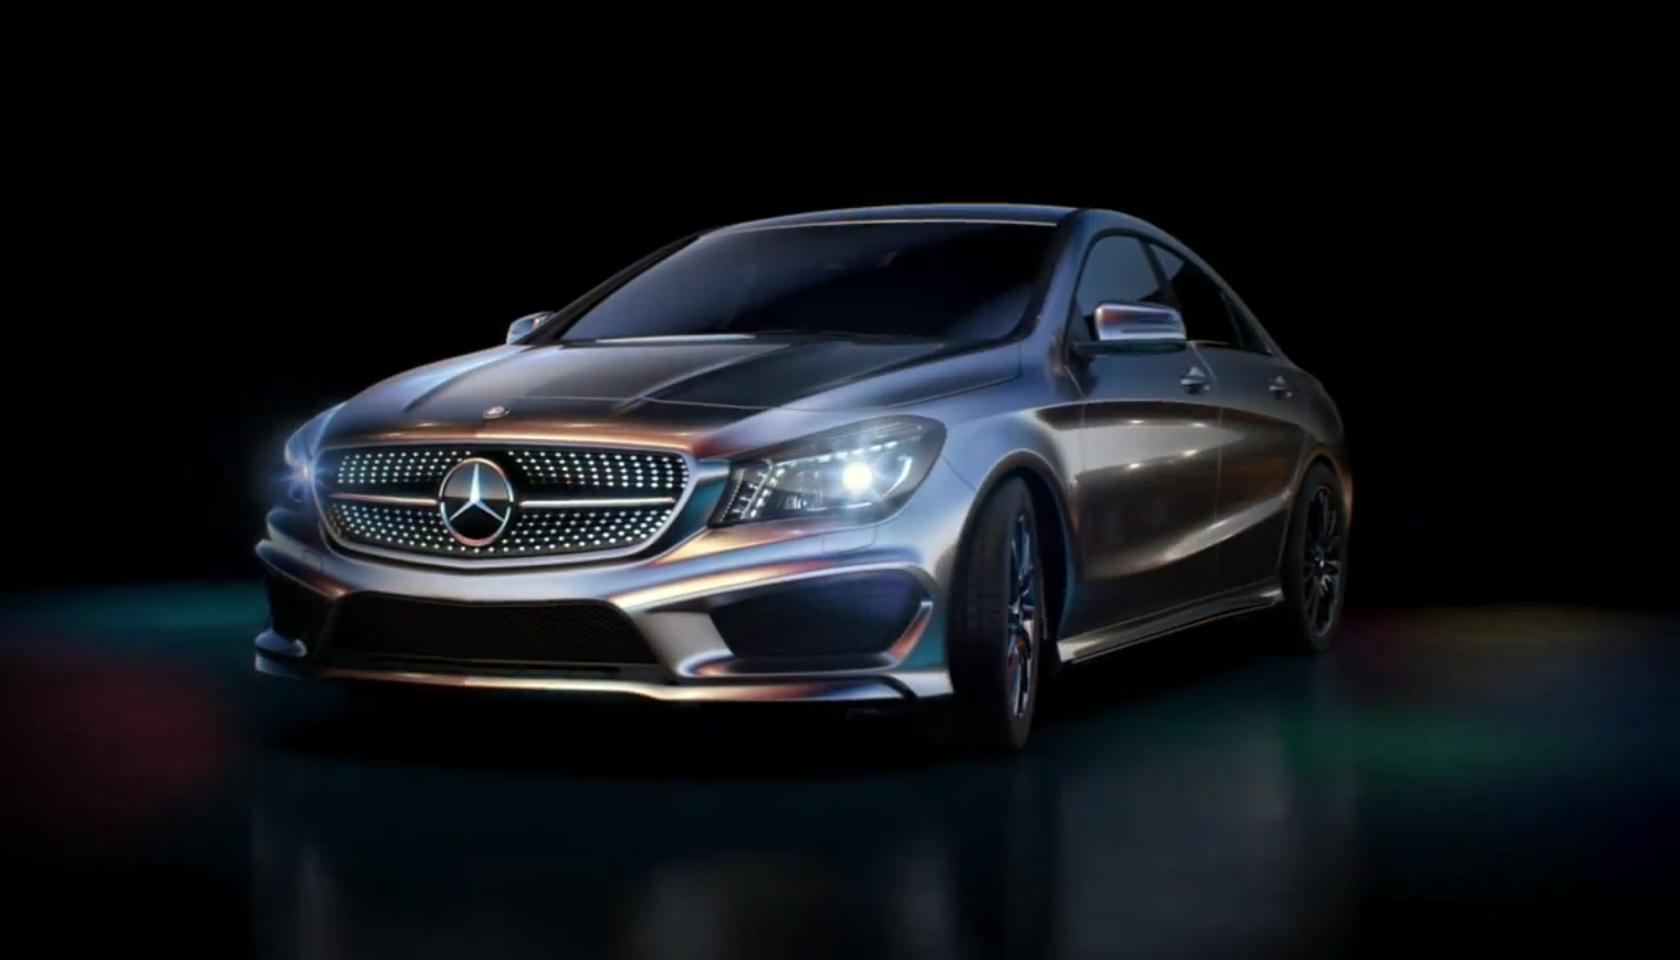 Mercedes benz cla gets alien launch commercial in japan for New mercedes benz commercial